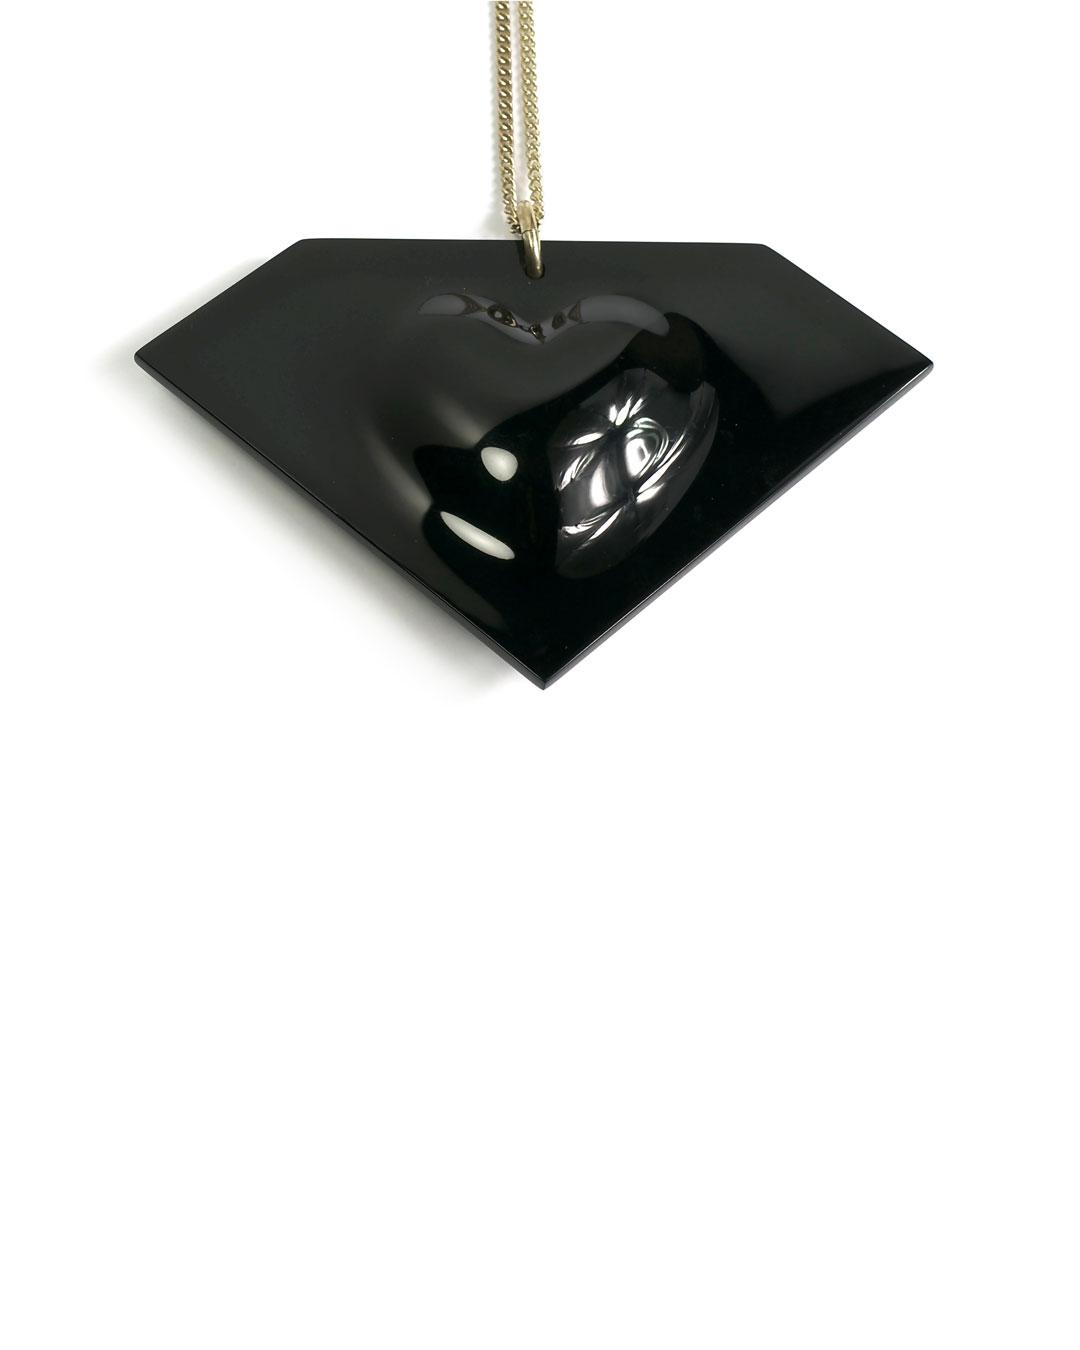 Florian Weichsberger, Diamond and Heart, 2009, pendant; plastic, silver, 110 x 70 x 20 mm, €1815